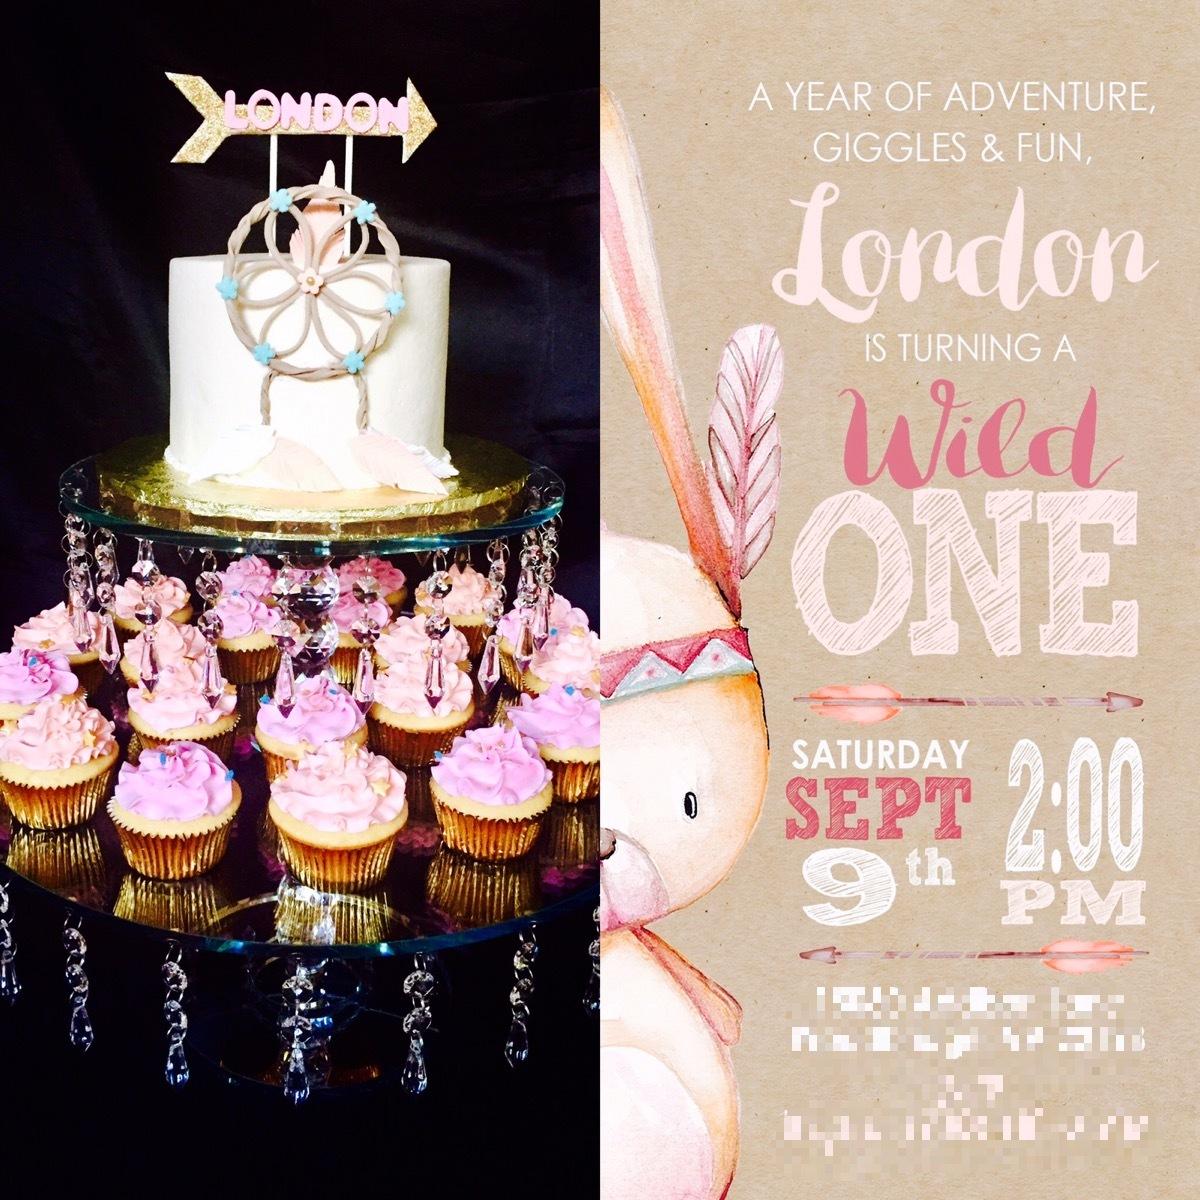 Custom cake to match the invitation!